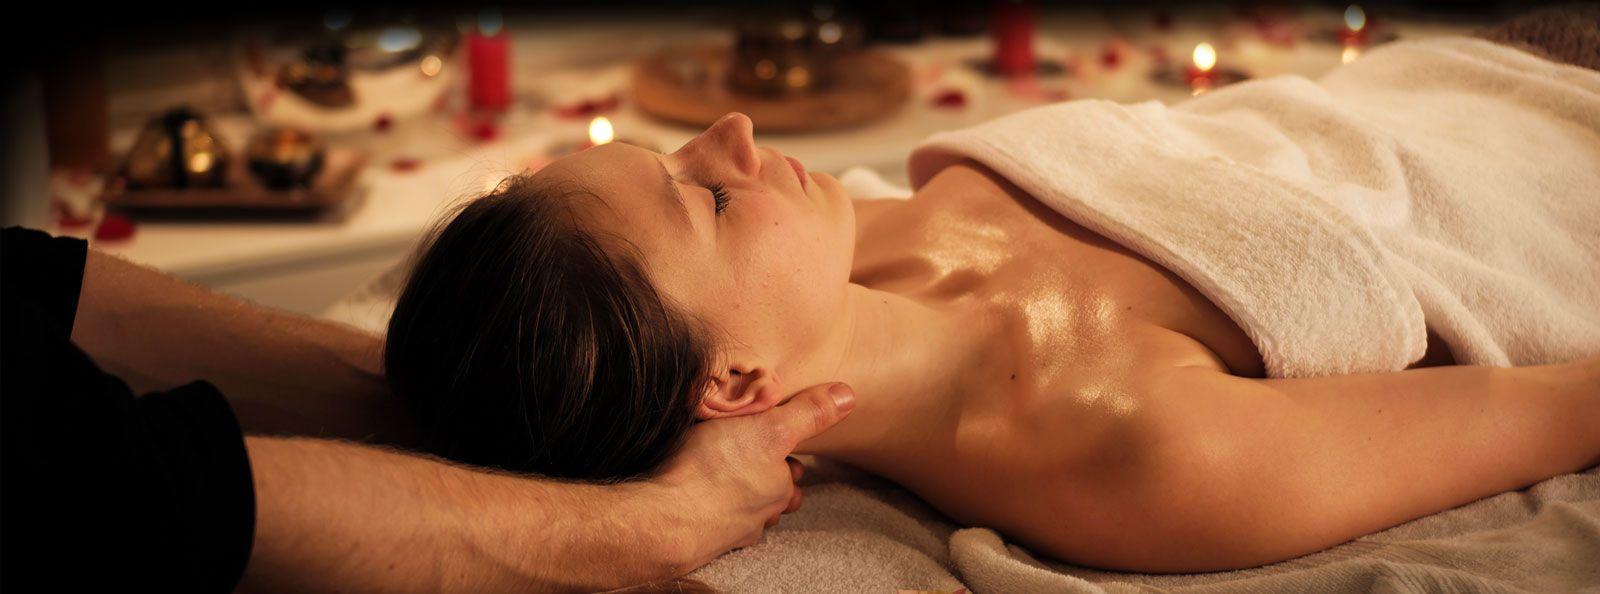 ayurveda spa massagen